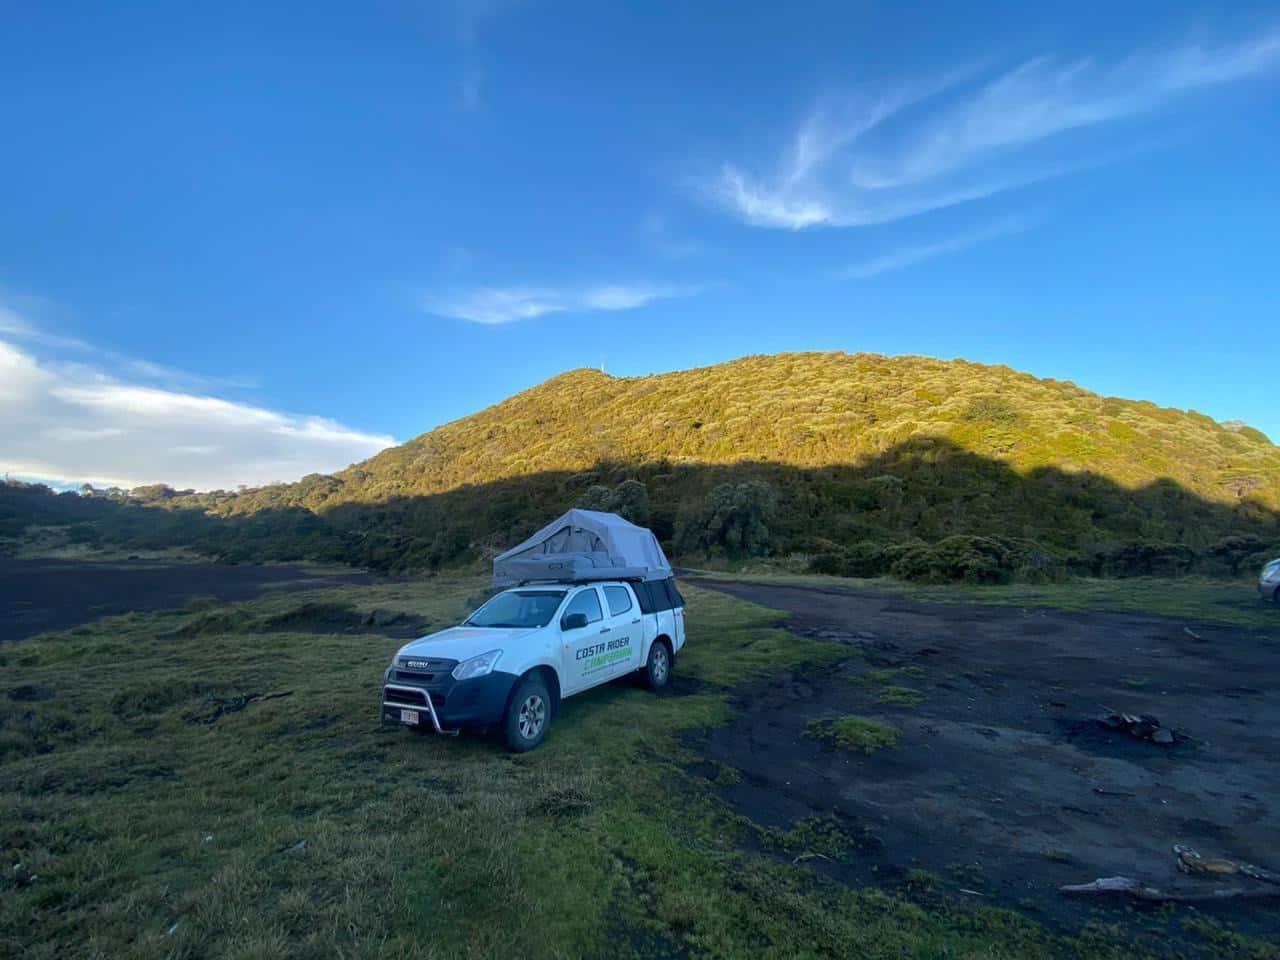 Campervan Familial 4x4 avec Tente : Explorez le Costa Rica en famille !